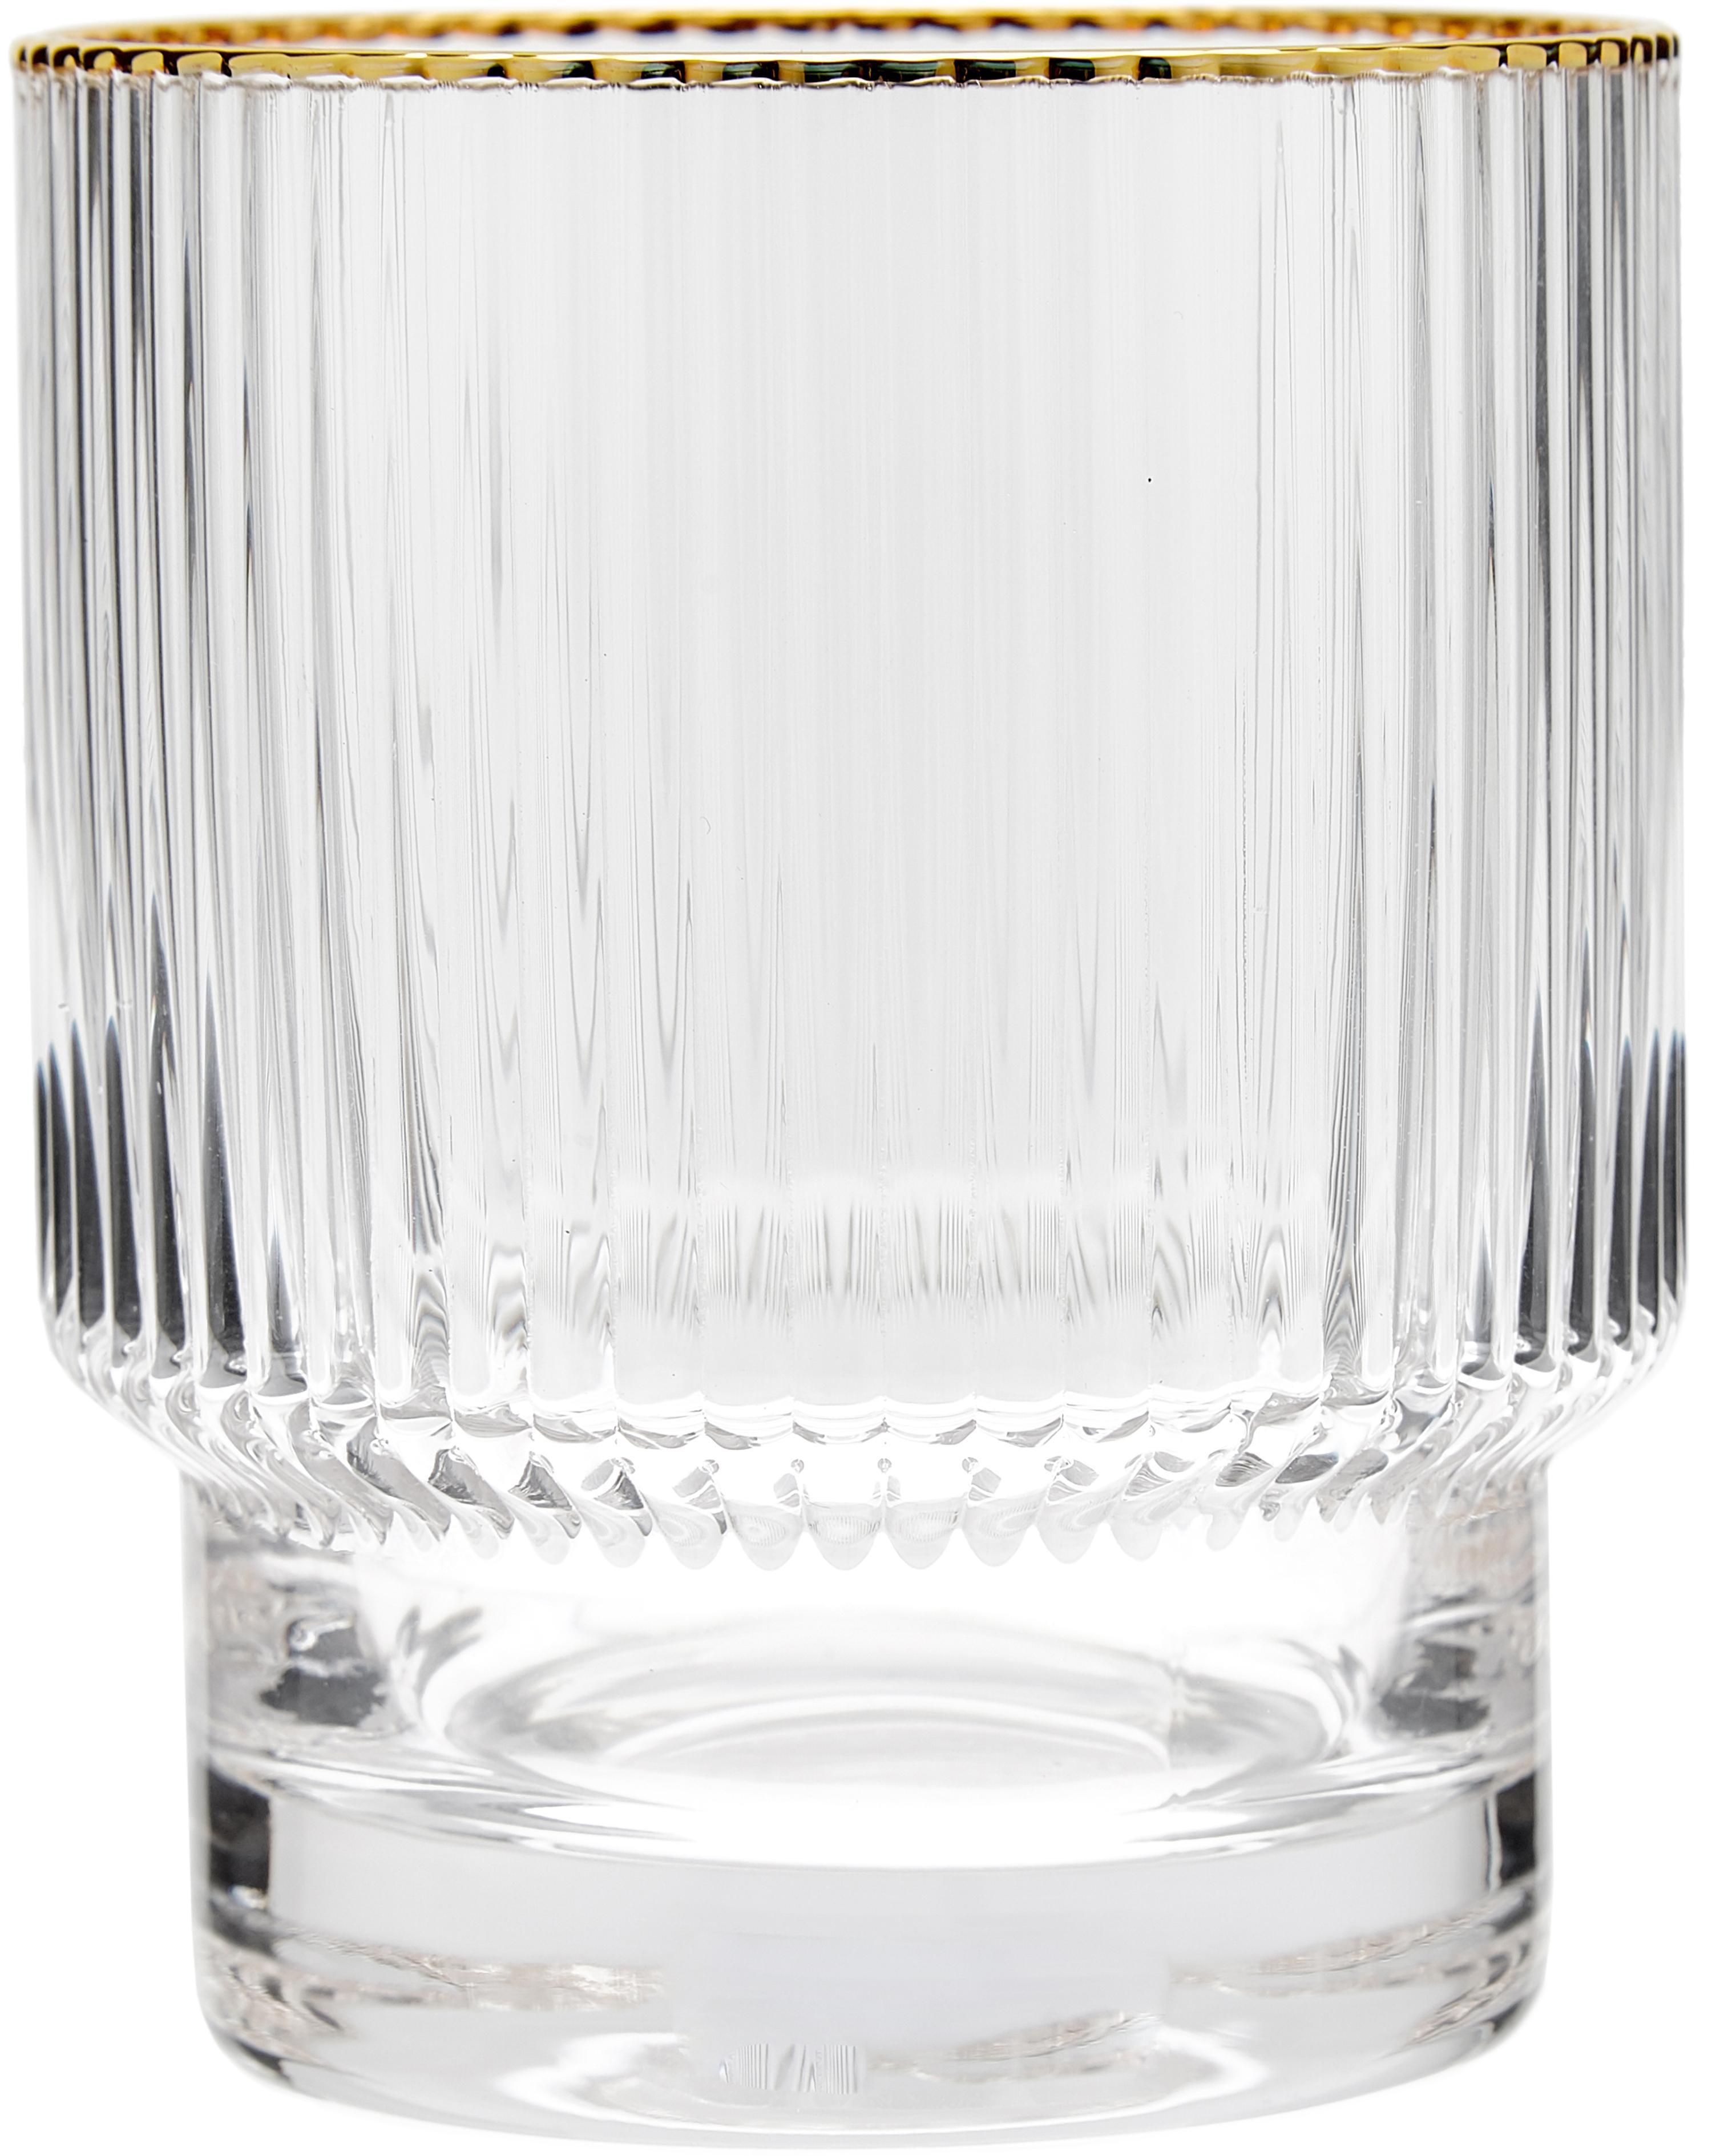 Waterglazen Minna met groefreliëf en gouden rand, 4 stuks, Glas, Transparant, goudkleurig, Ø 8 x H 10 cm